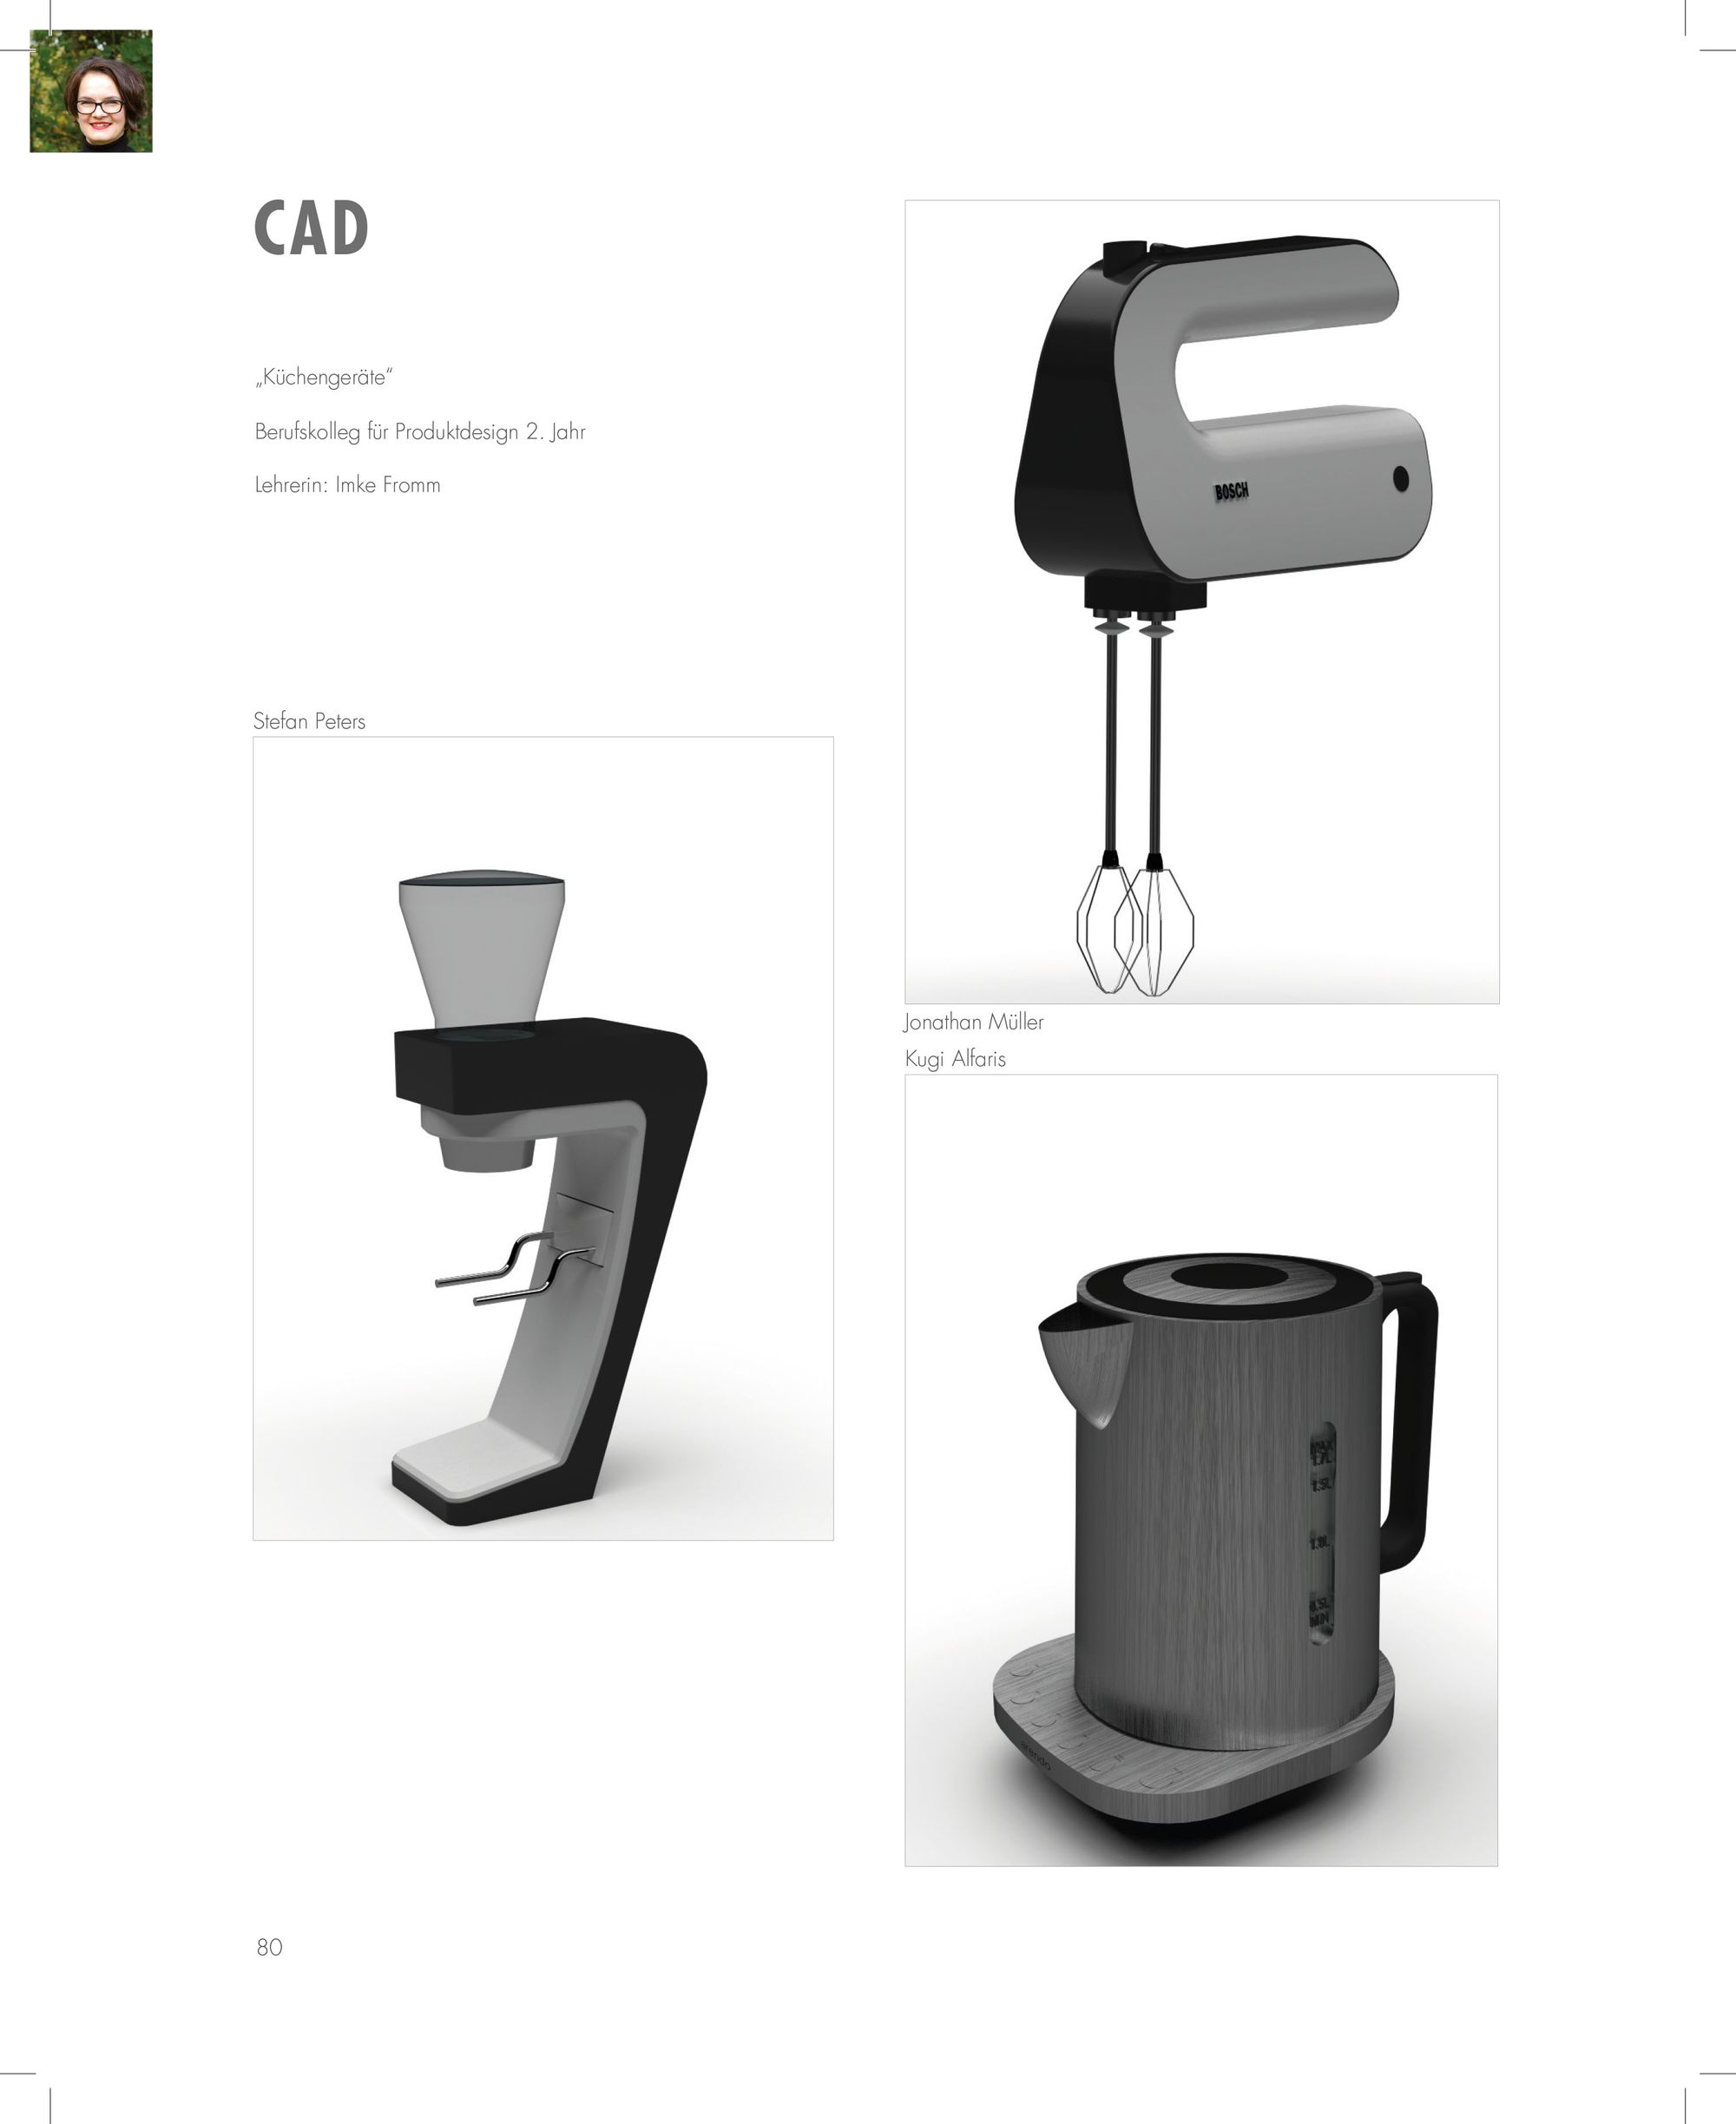 Creativ_2020_CAD-1-1